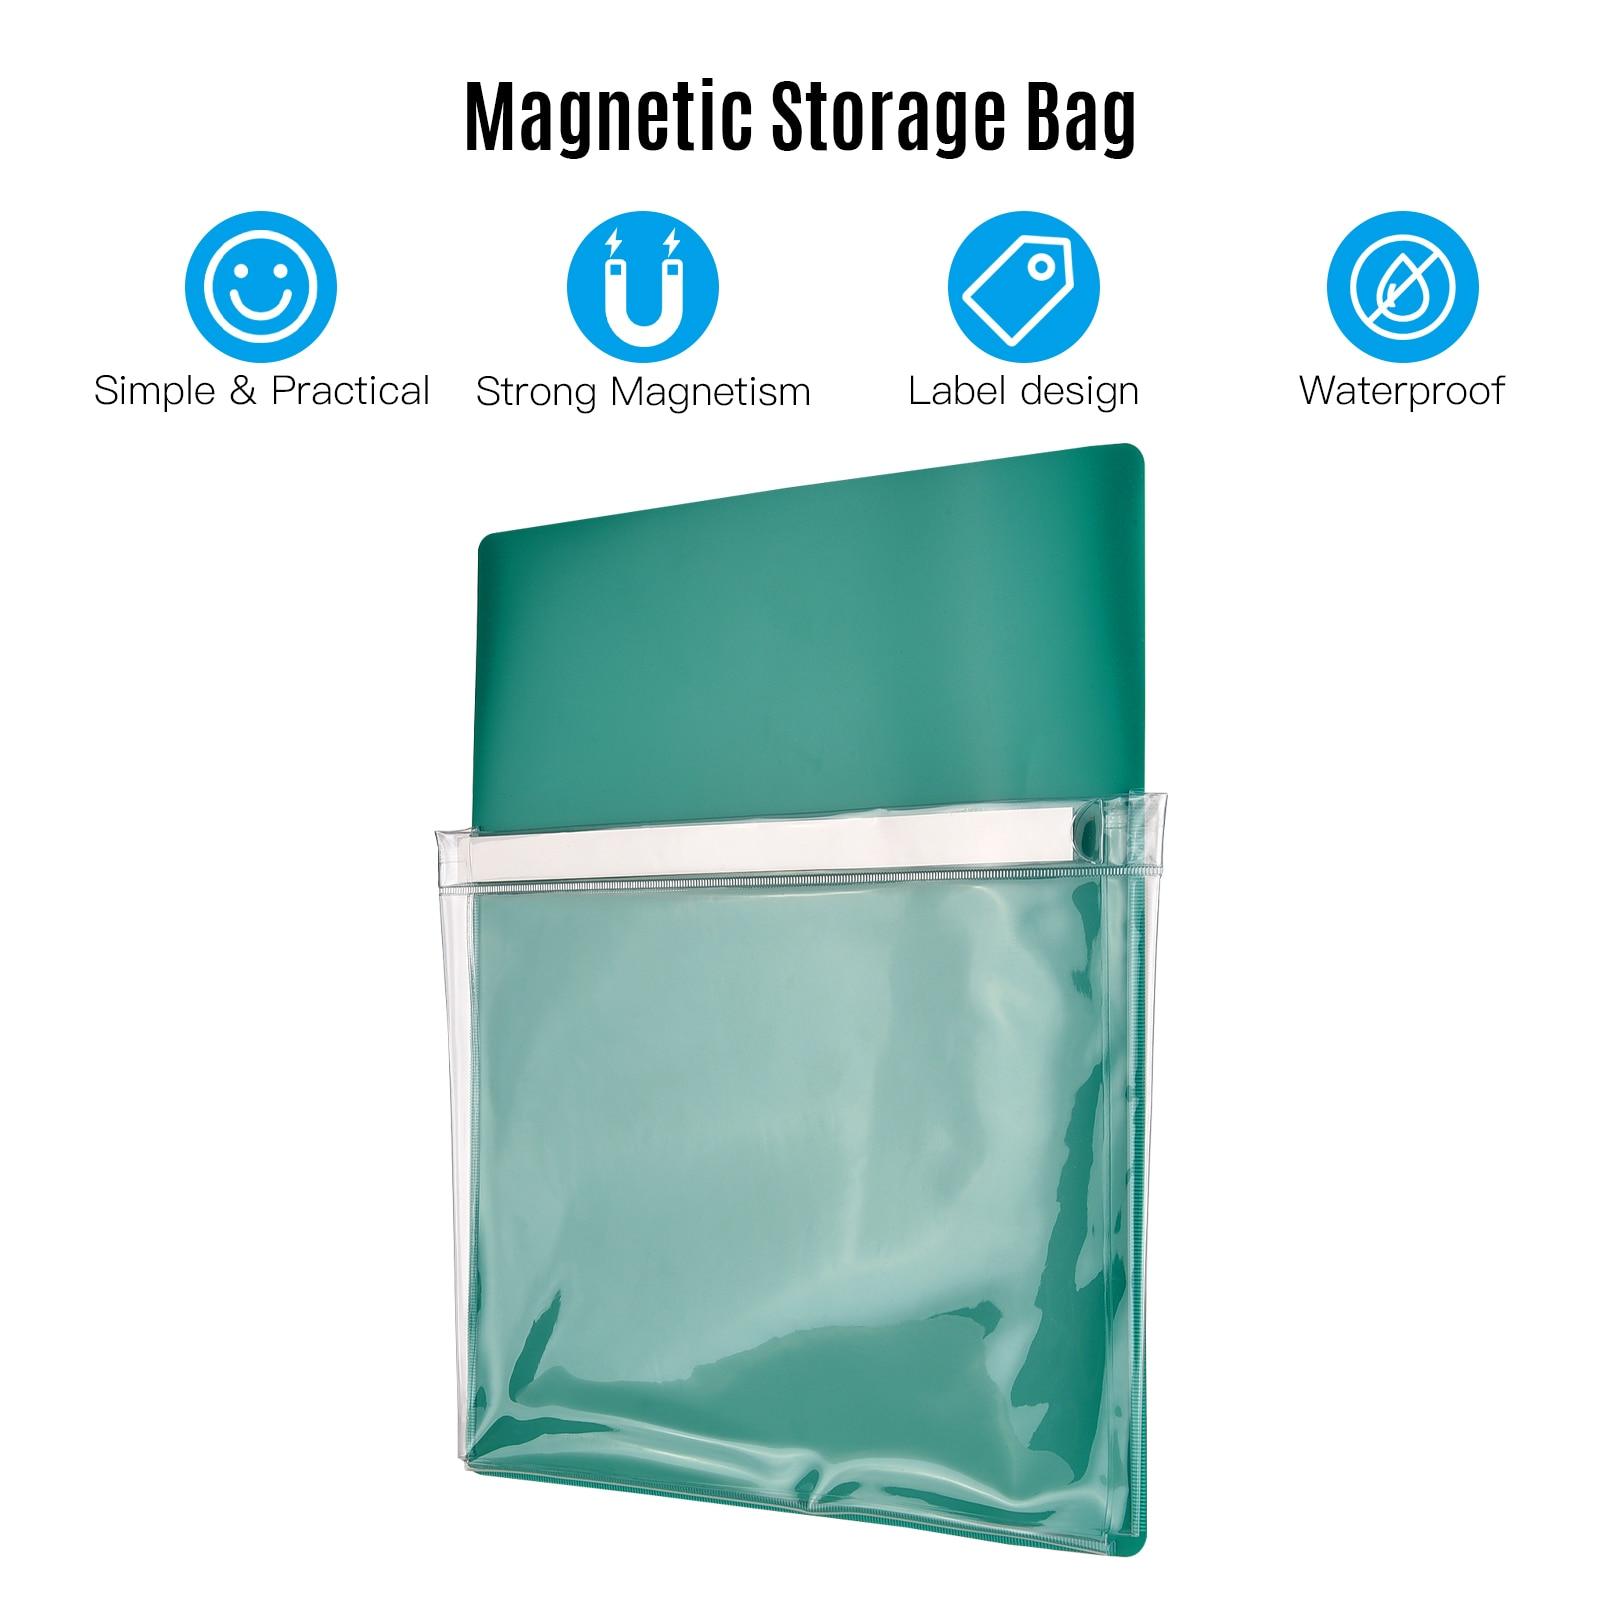 Magnetic Pocket Pen Holder Notebook Tools Accessories Storage Bag for Whiteboard Fridge Locker Cabinet